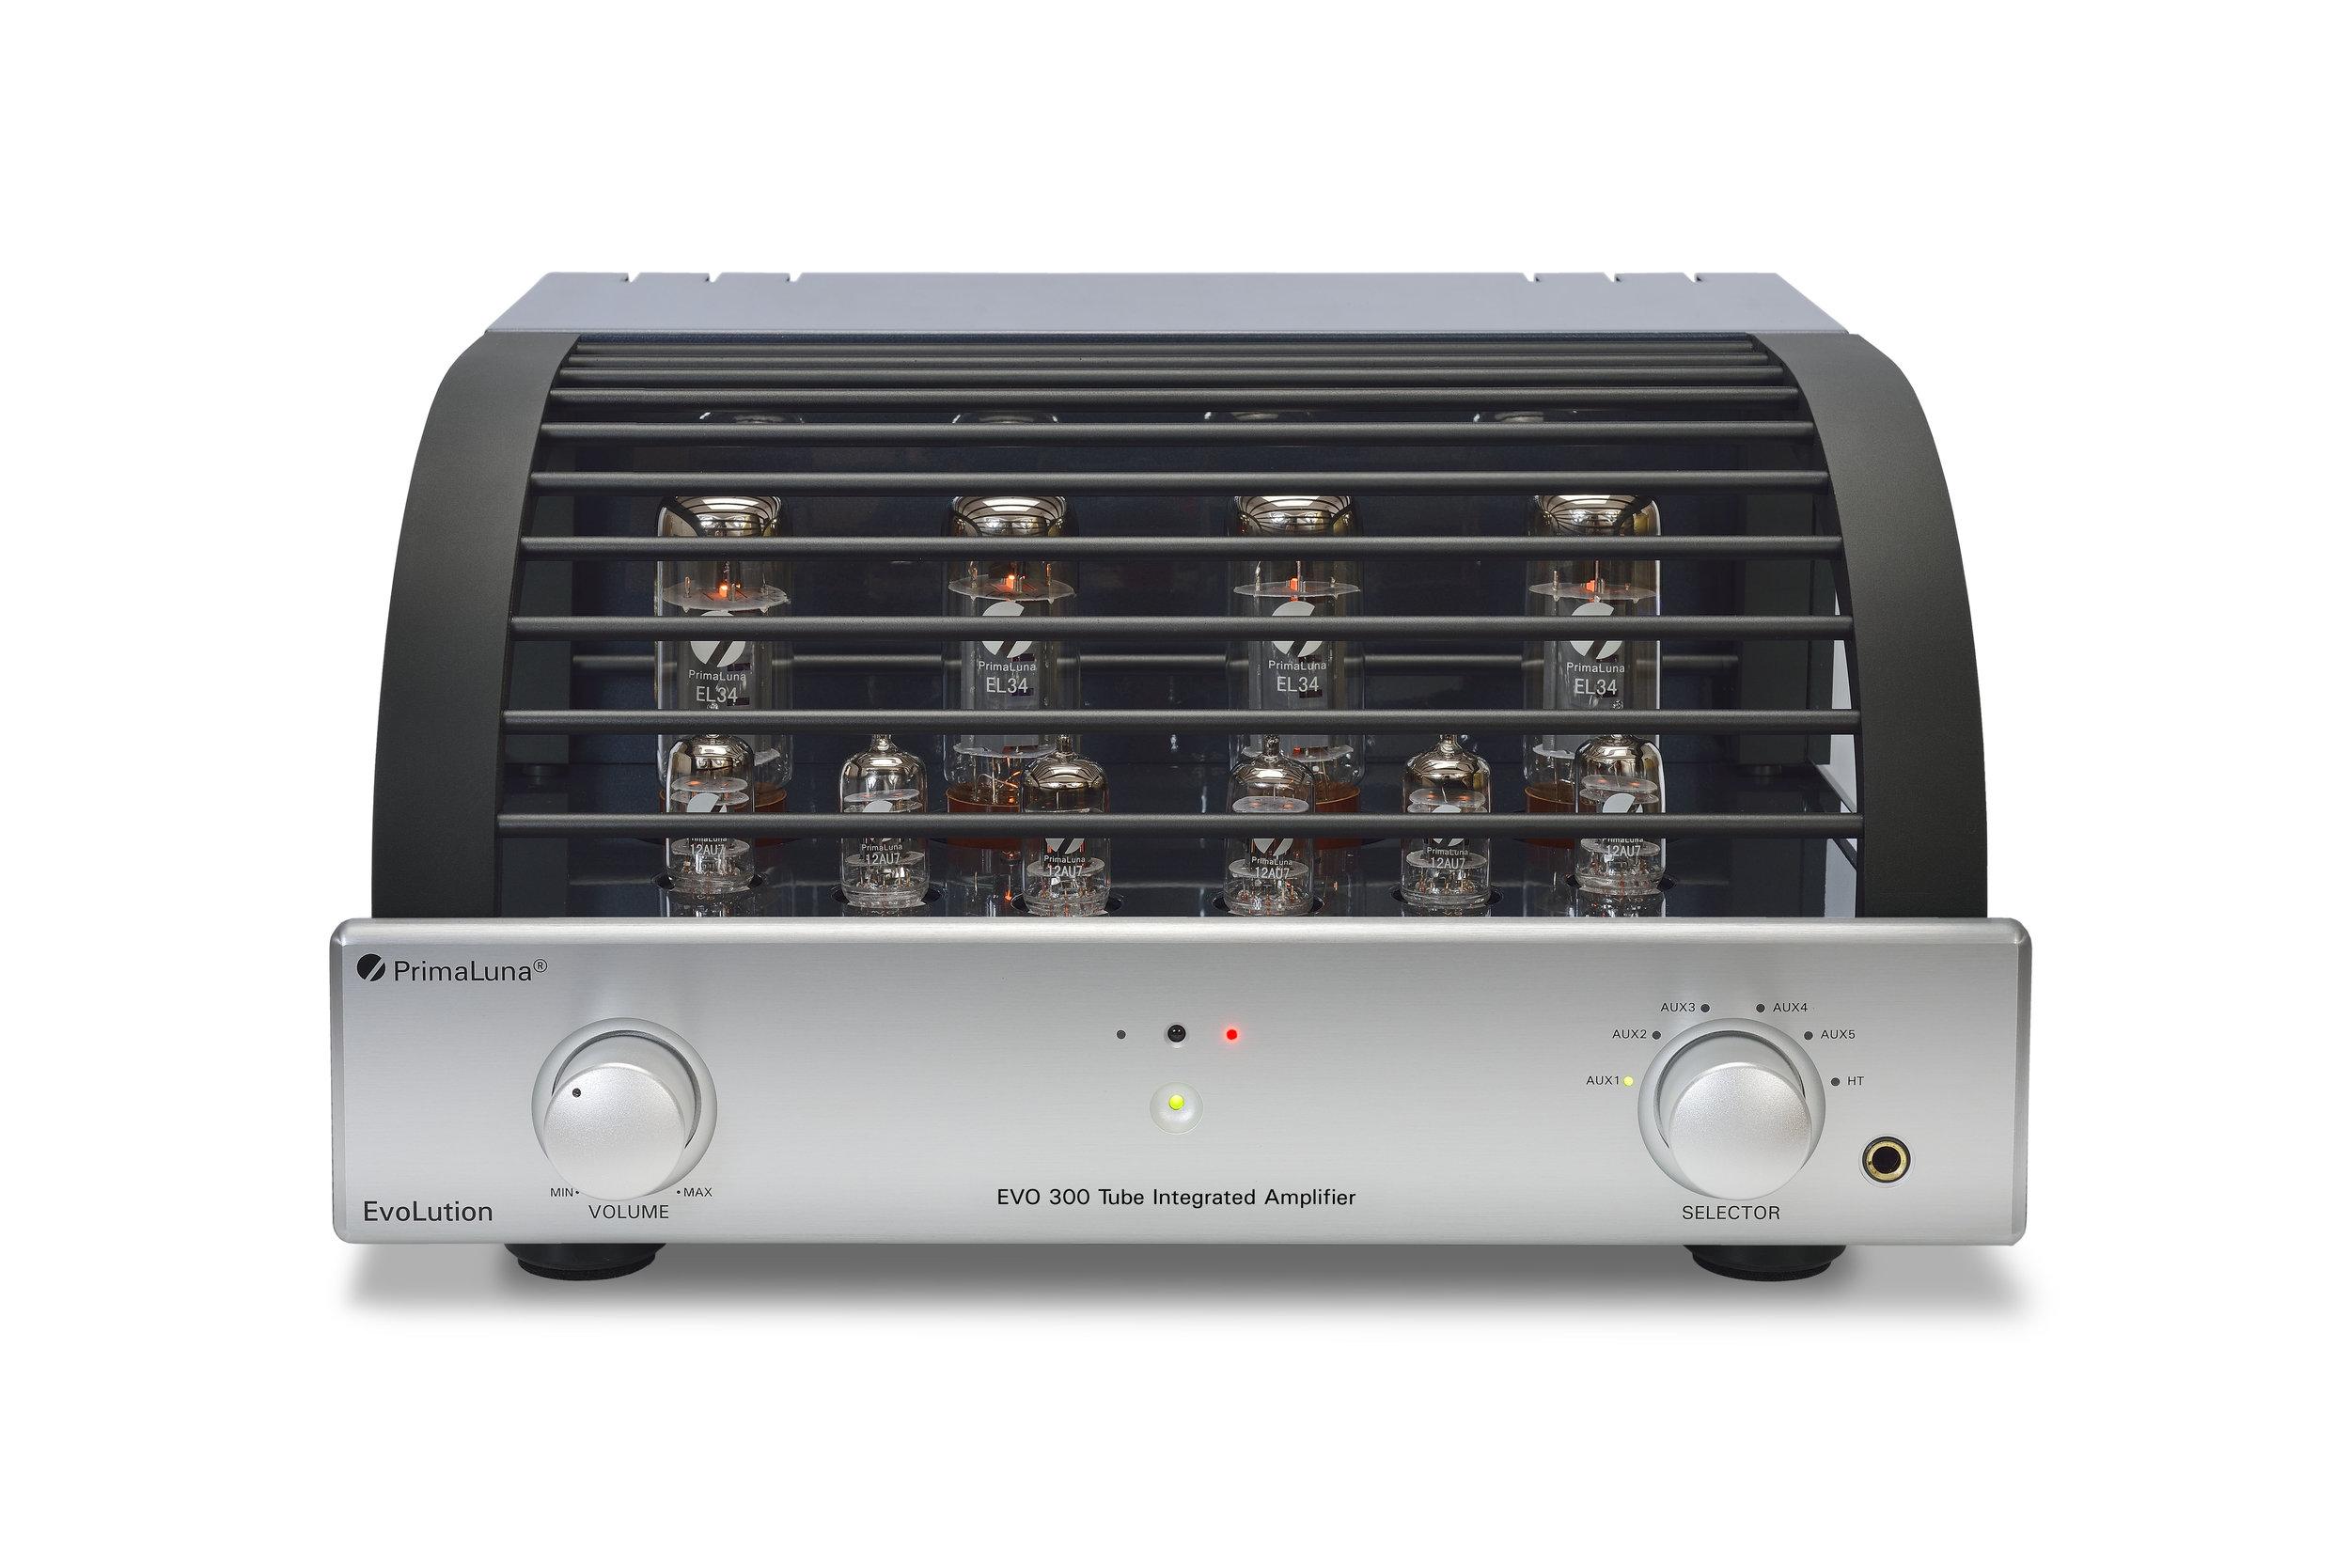 042b - PrimaLuna Evo 300 Tube Integrated Amplifier - silver - white background - kopie.jpg